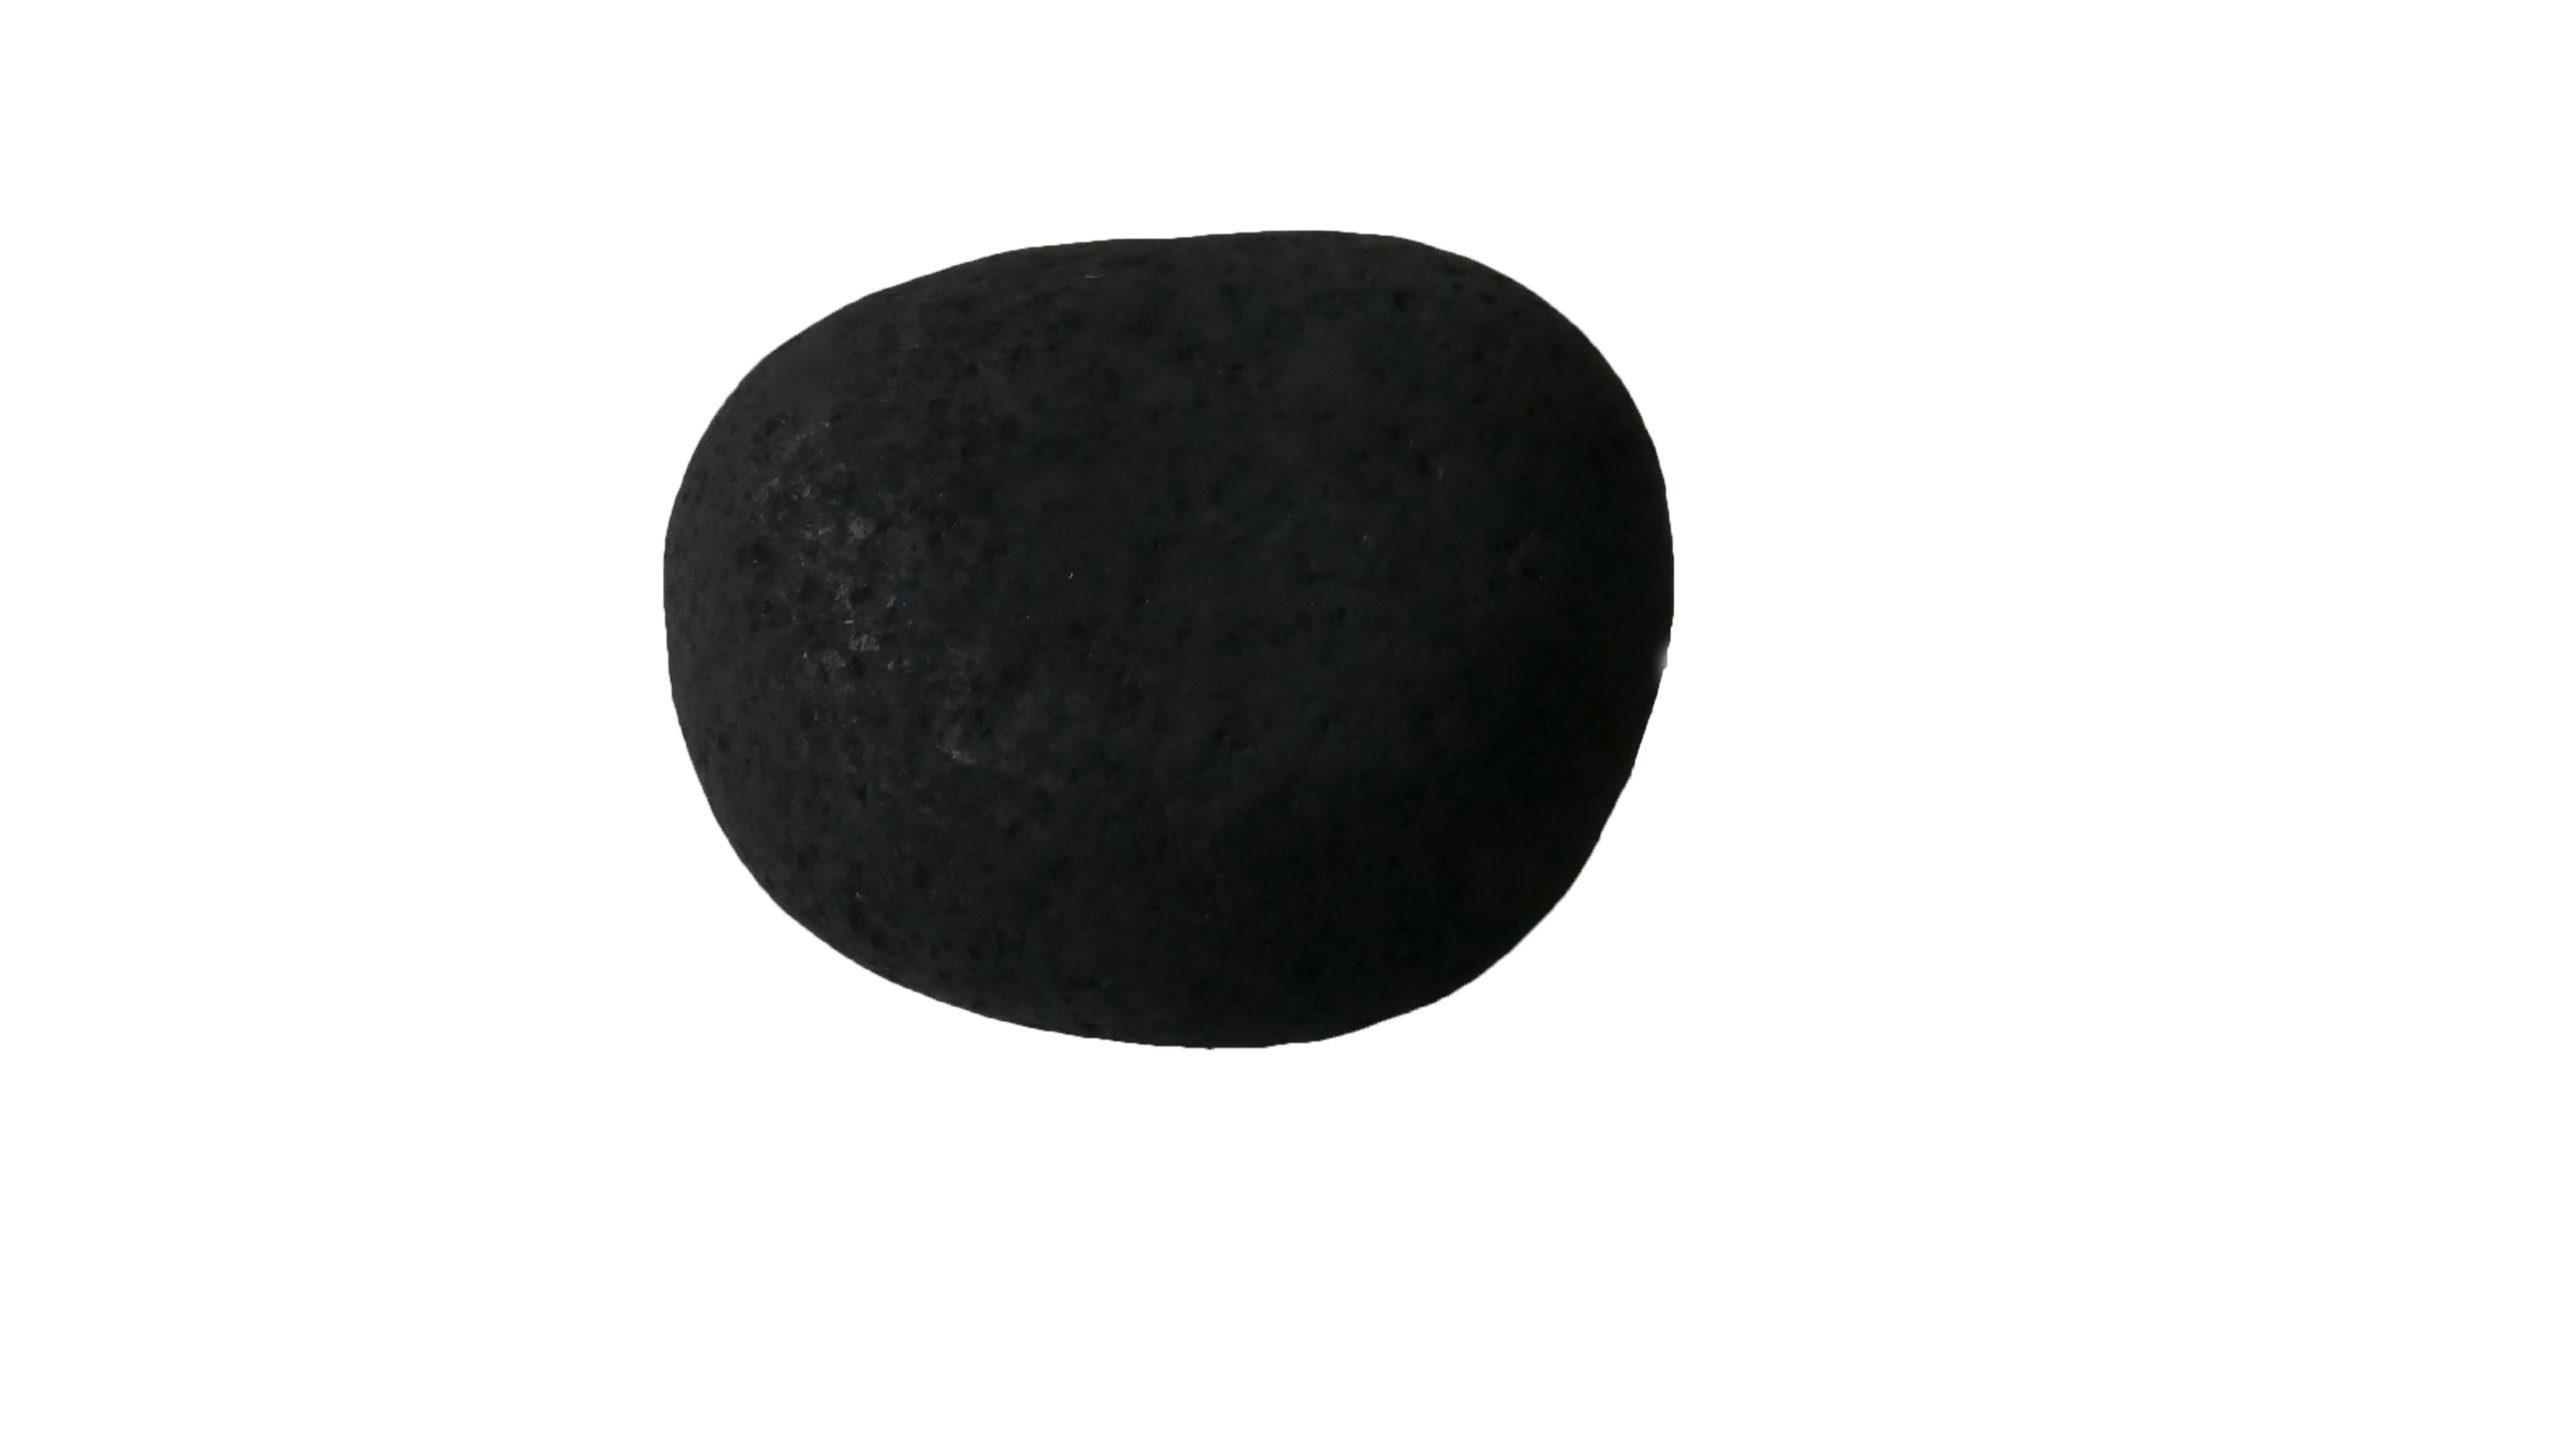 Deze Shungite steen weegt 293